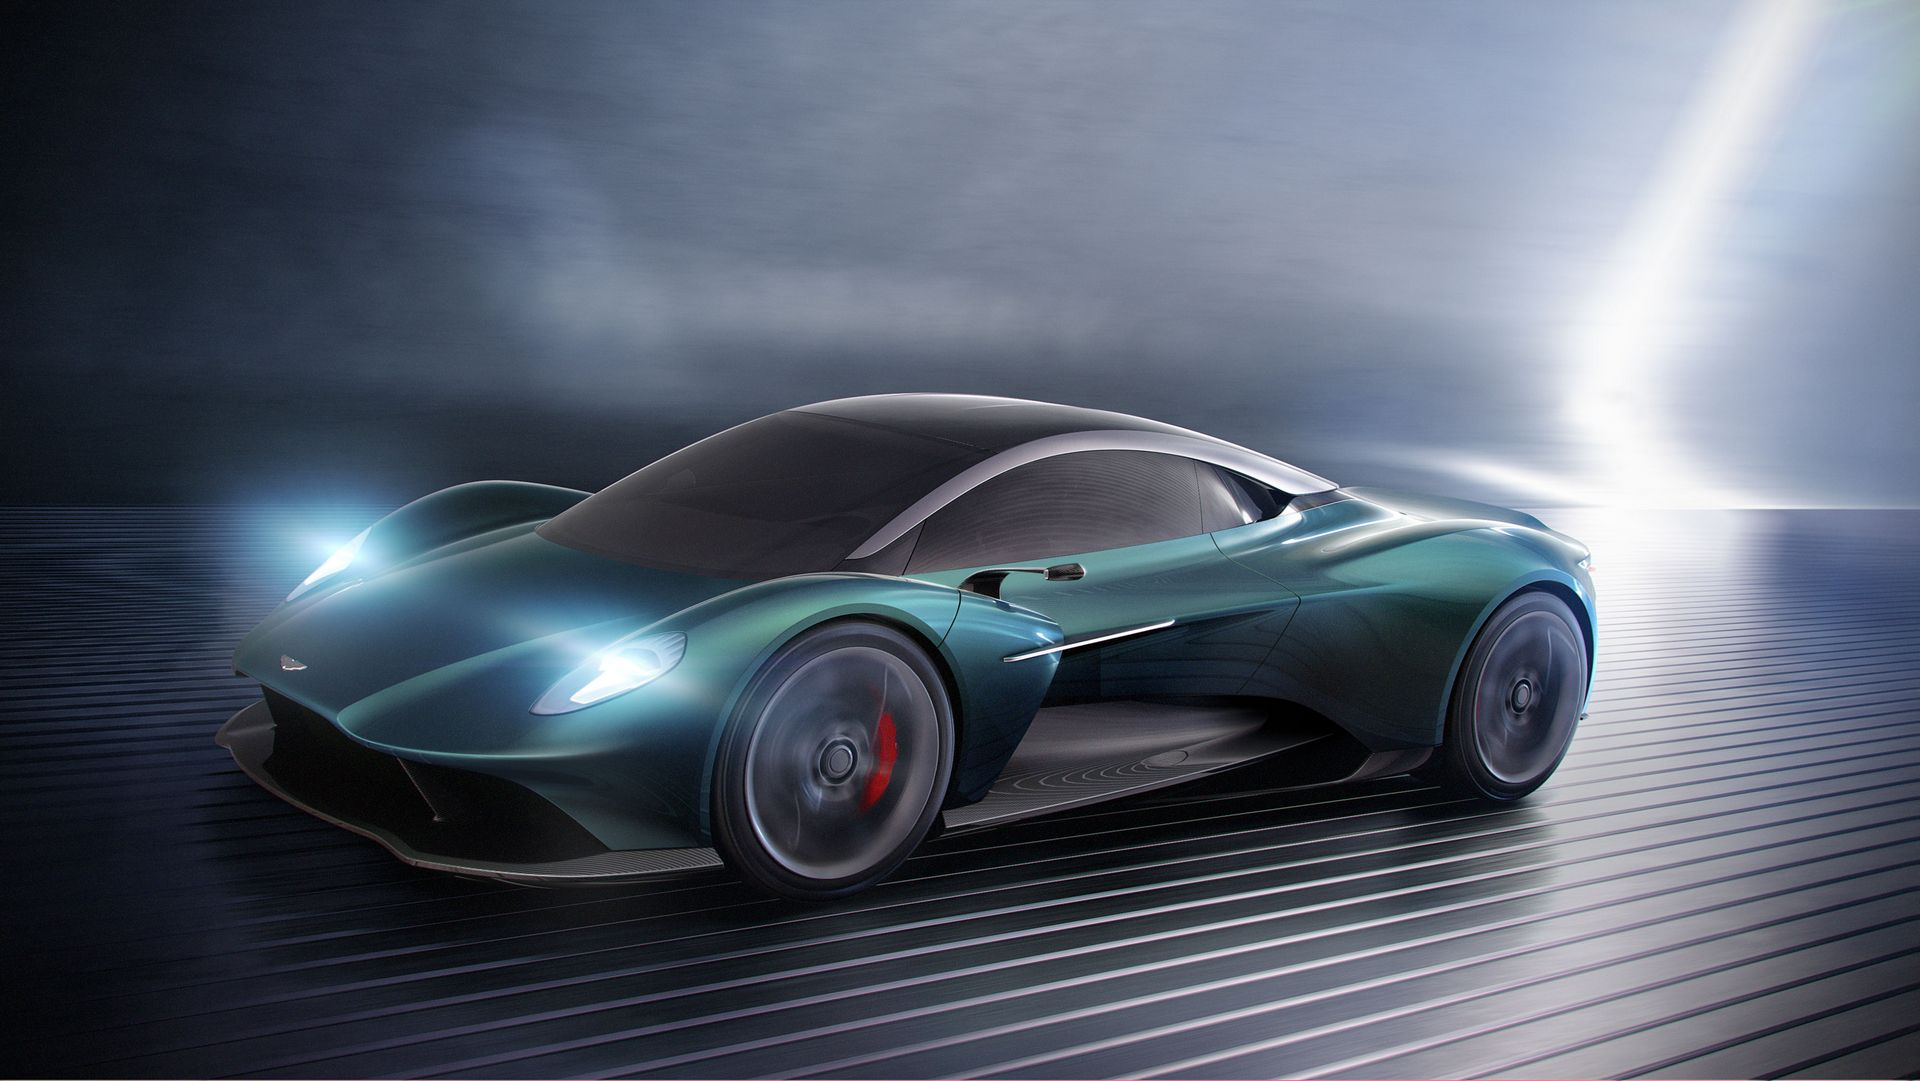 Aston Martin Vanquish Vision Concept (6)